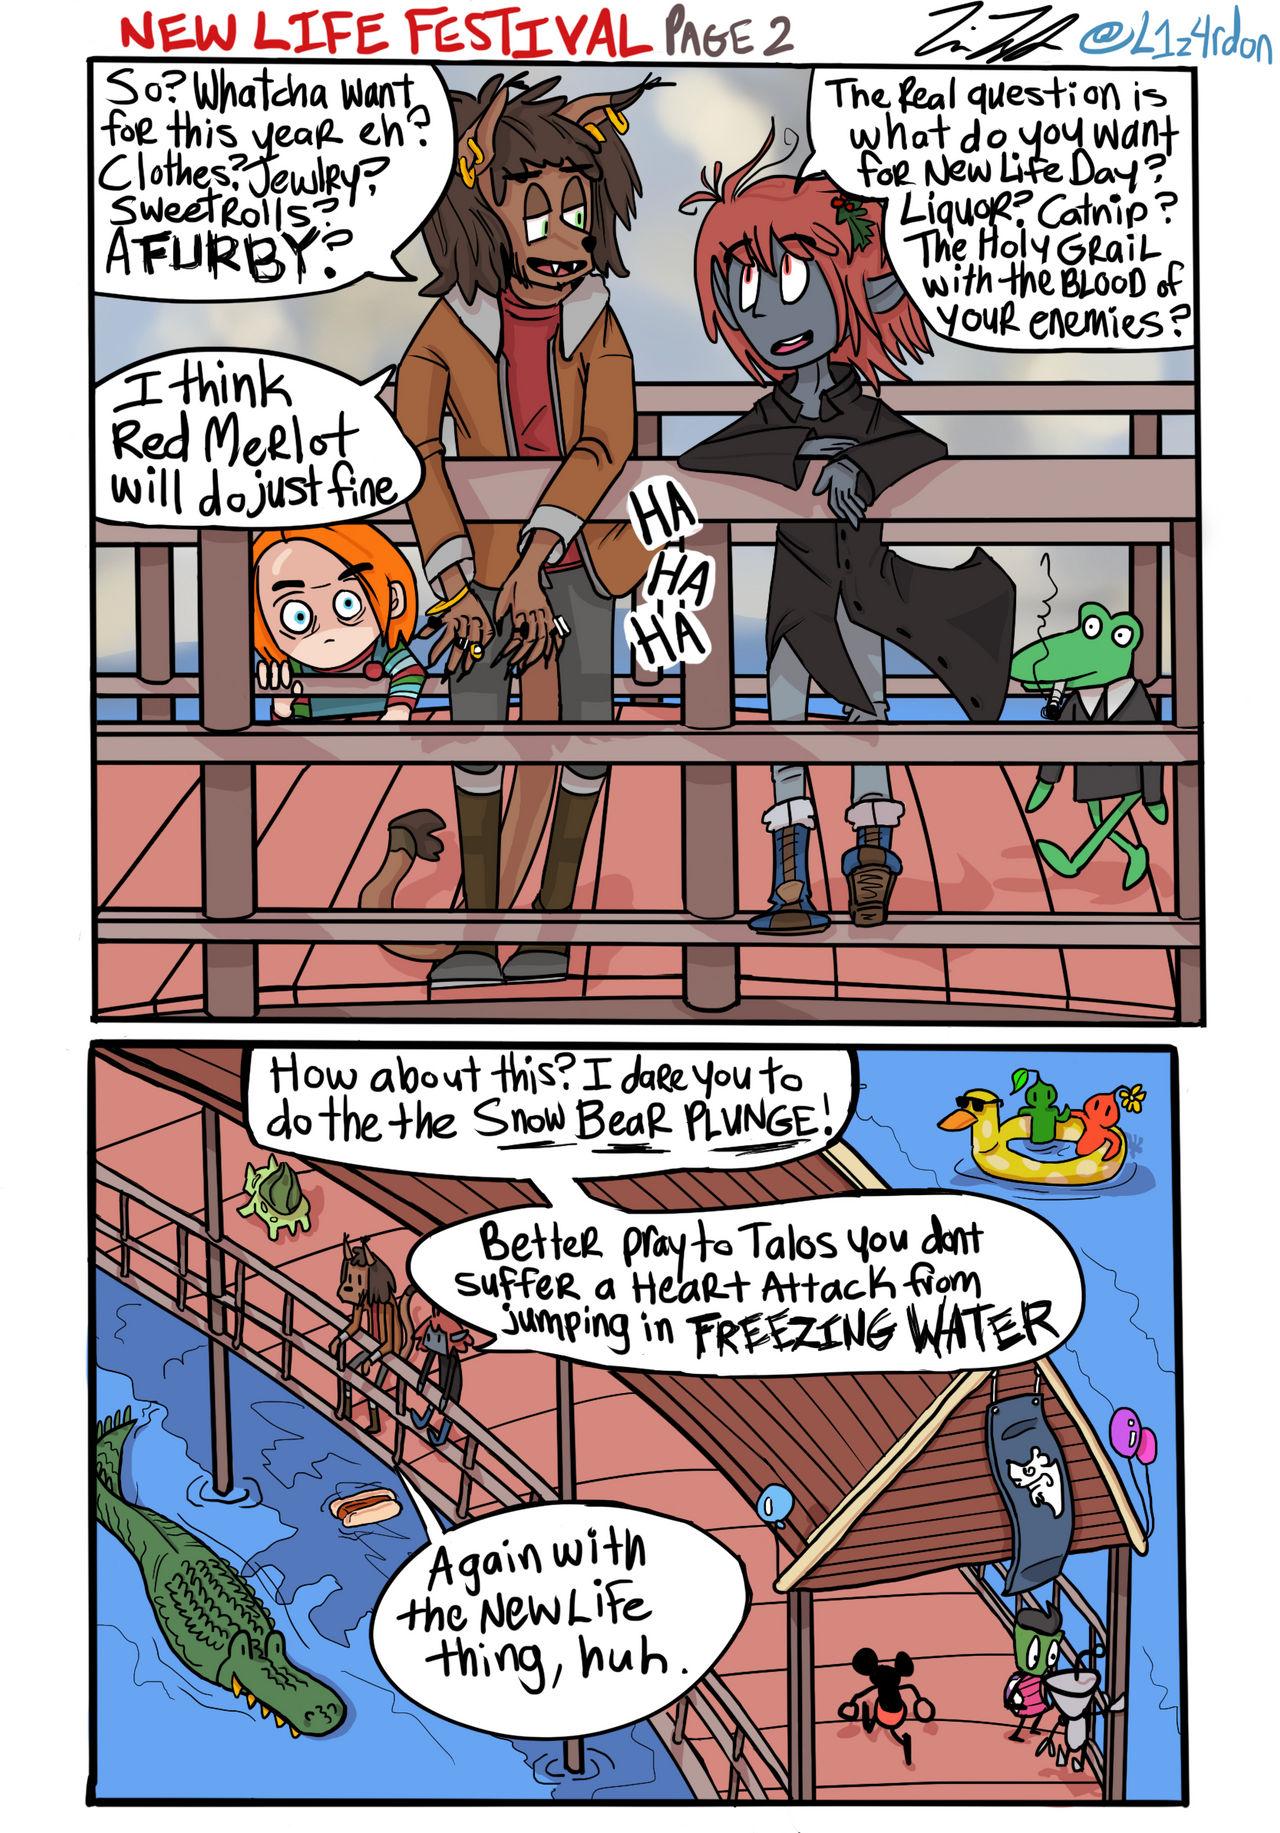 ESO New Life Fest fancomic page 2